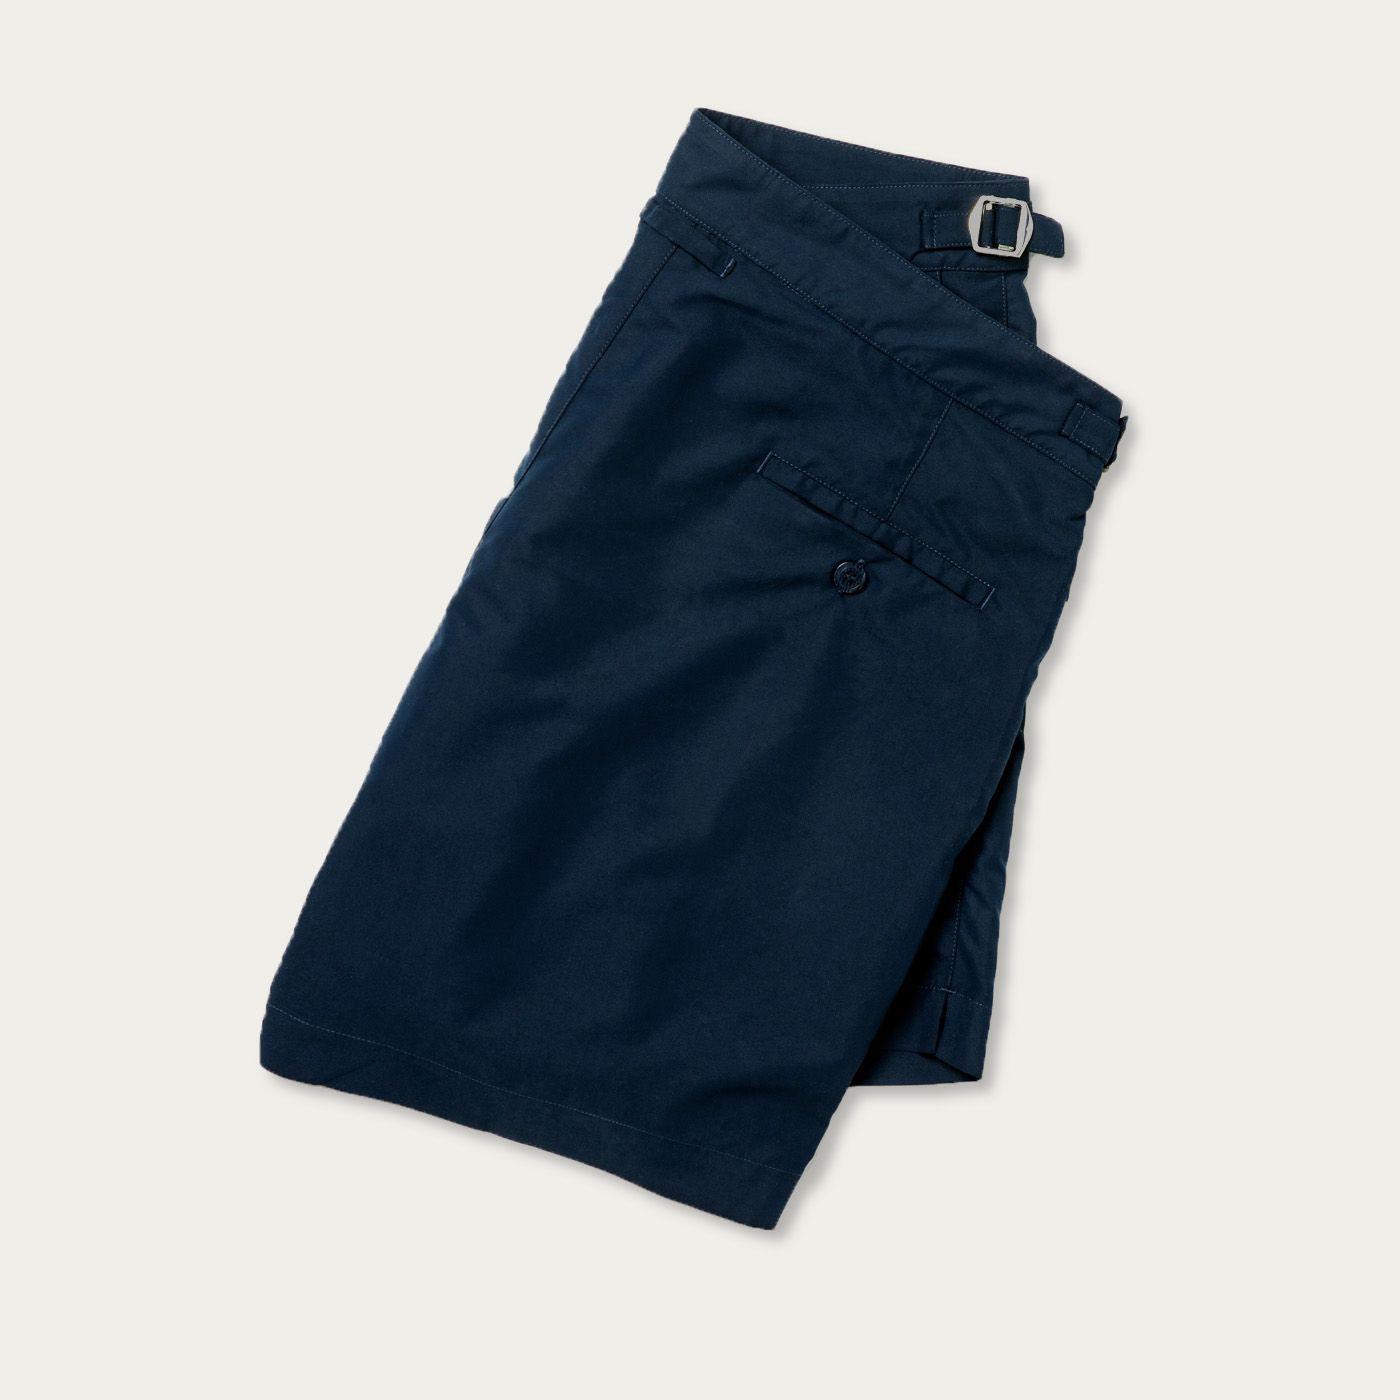 Navy Blue Tailored Swim Shorts   Bombinate